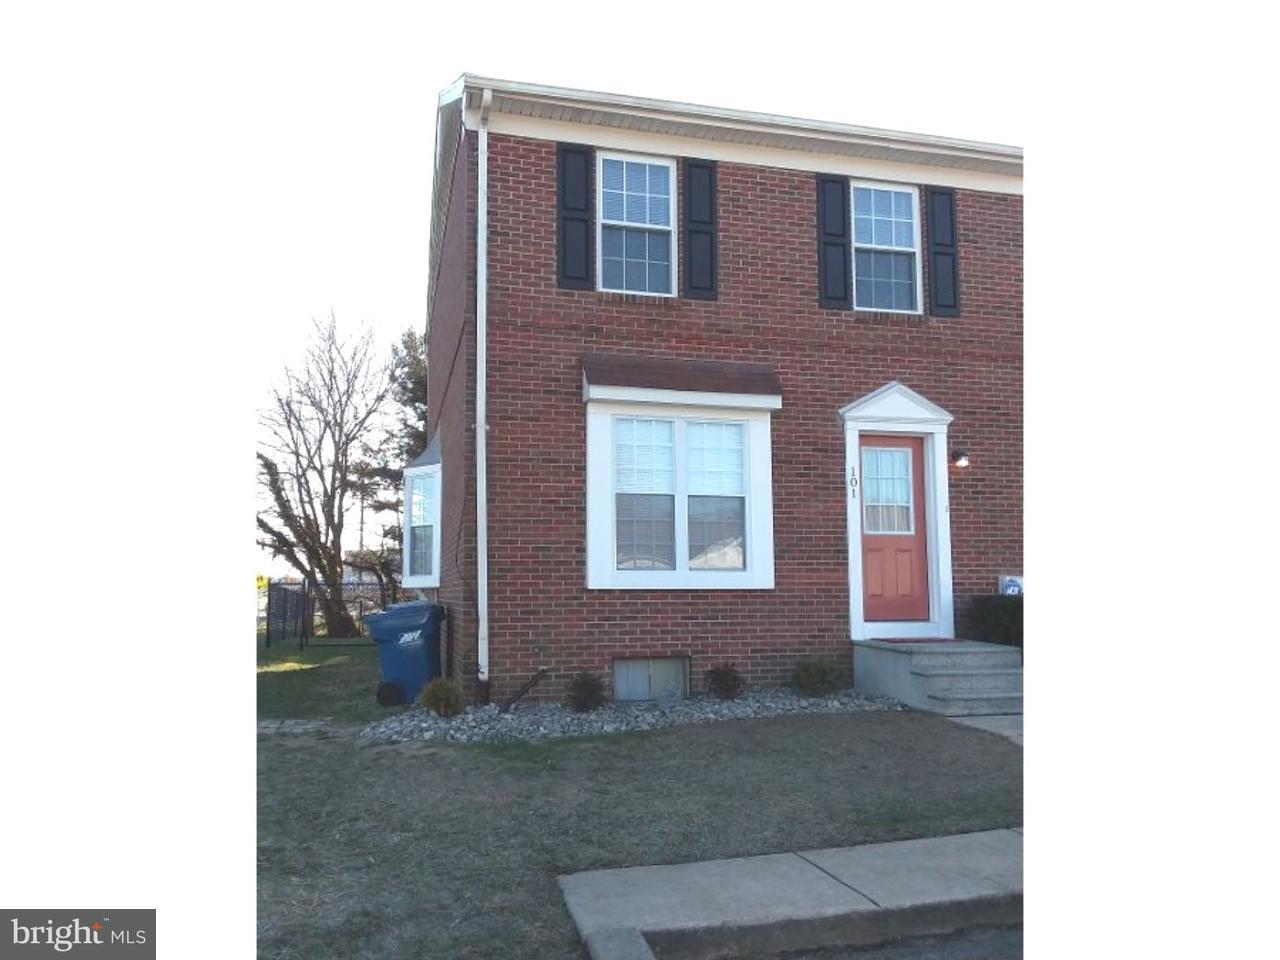 Casa unifamiliar adosada (Townhouse) por un Alquiler en 101 MEETING HOUSE Lane Camden, Delaware 19934 Estados Unidos